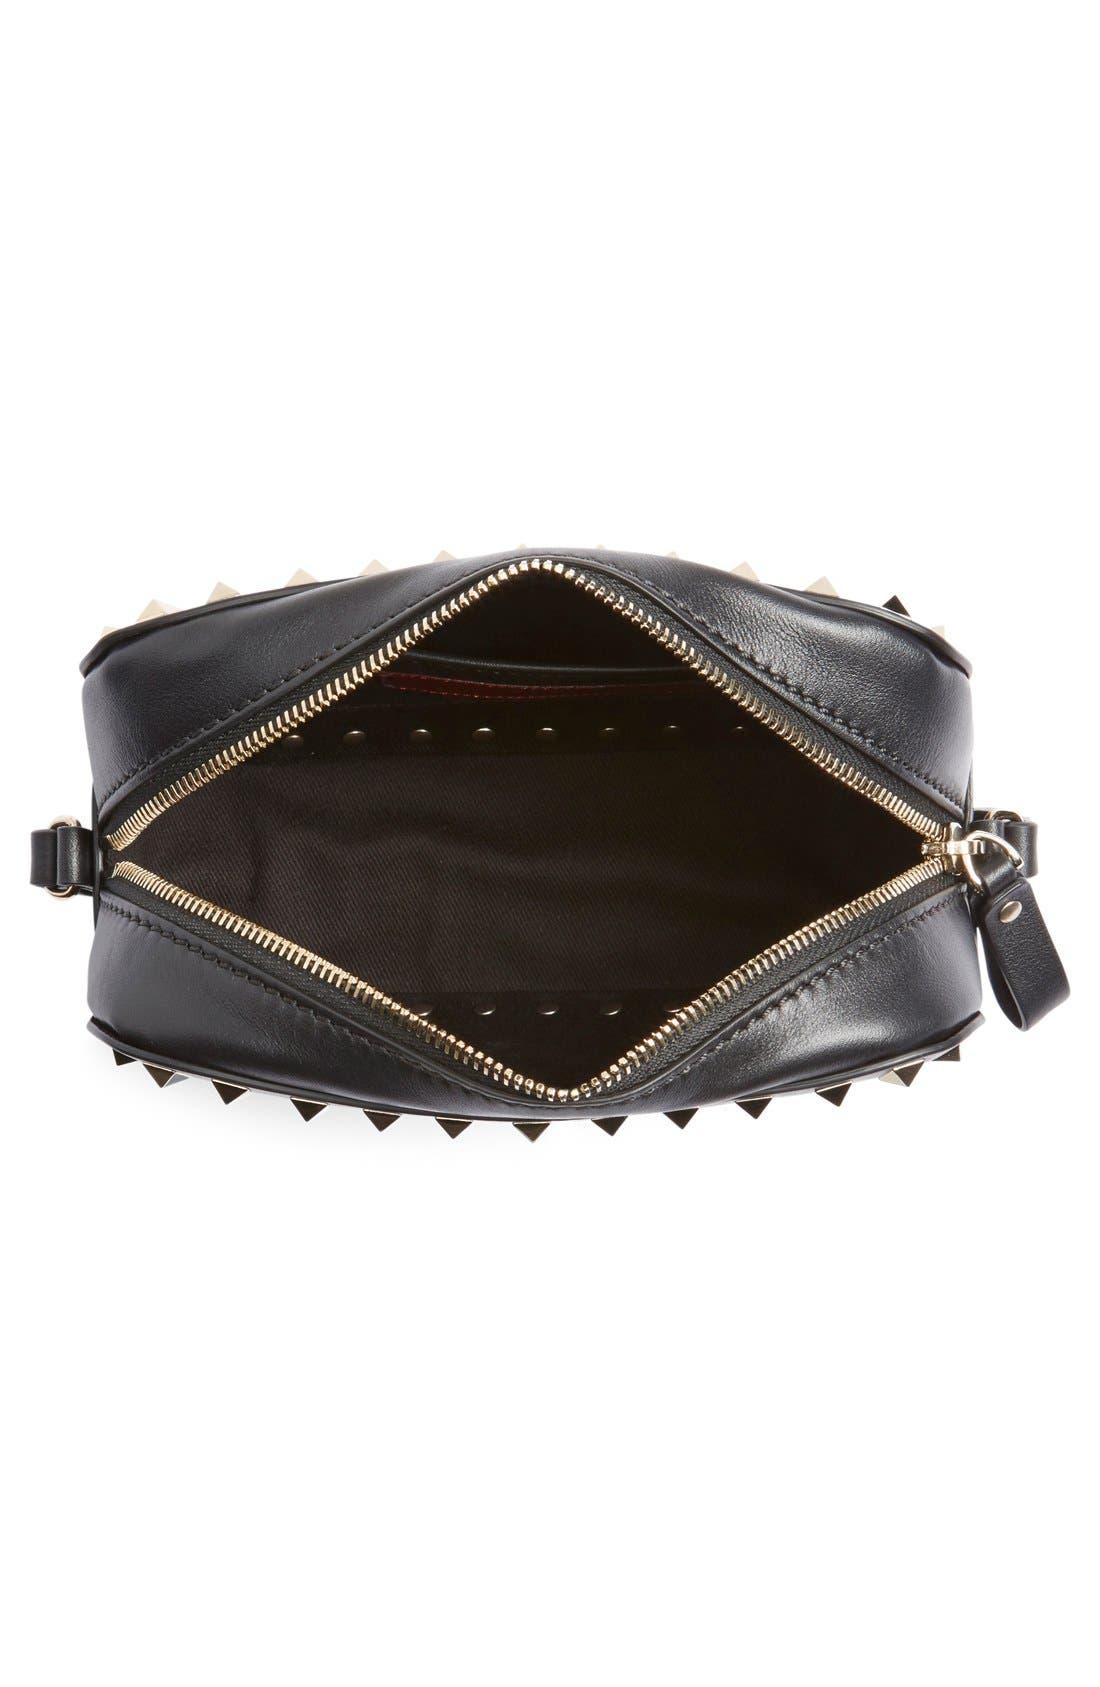 'Rockstud' Calfskin Leather Camera Crossbody Bag,                             Alternate thumbnail 10, color,                             NERO